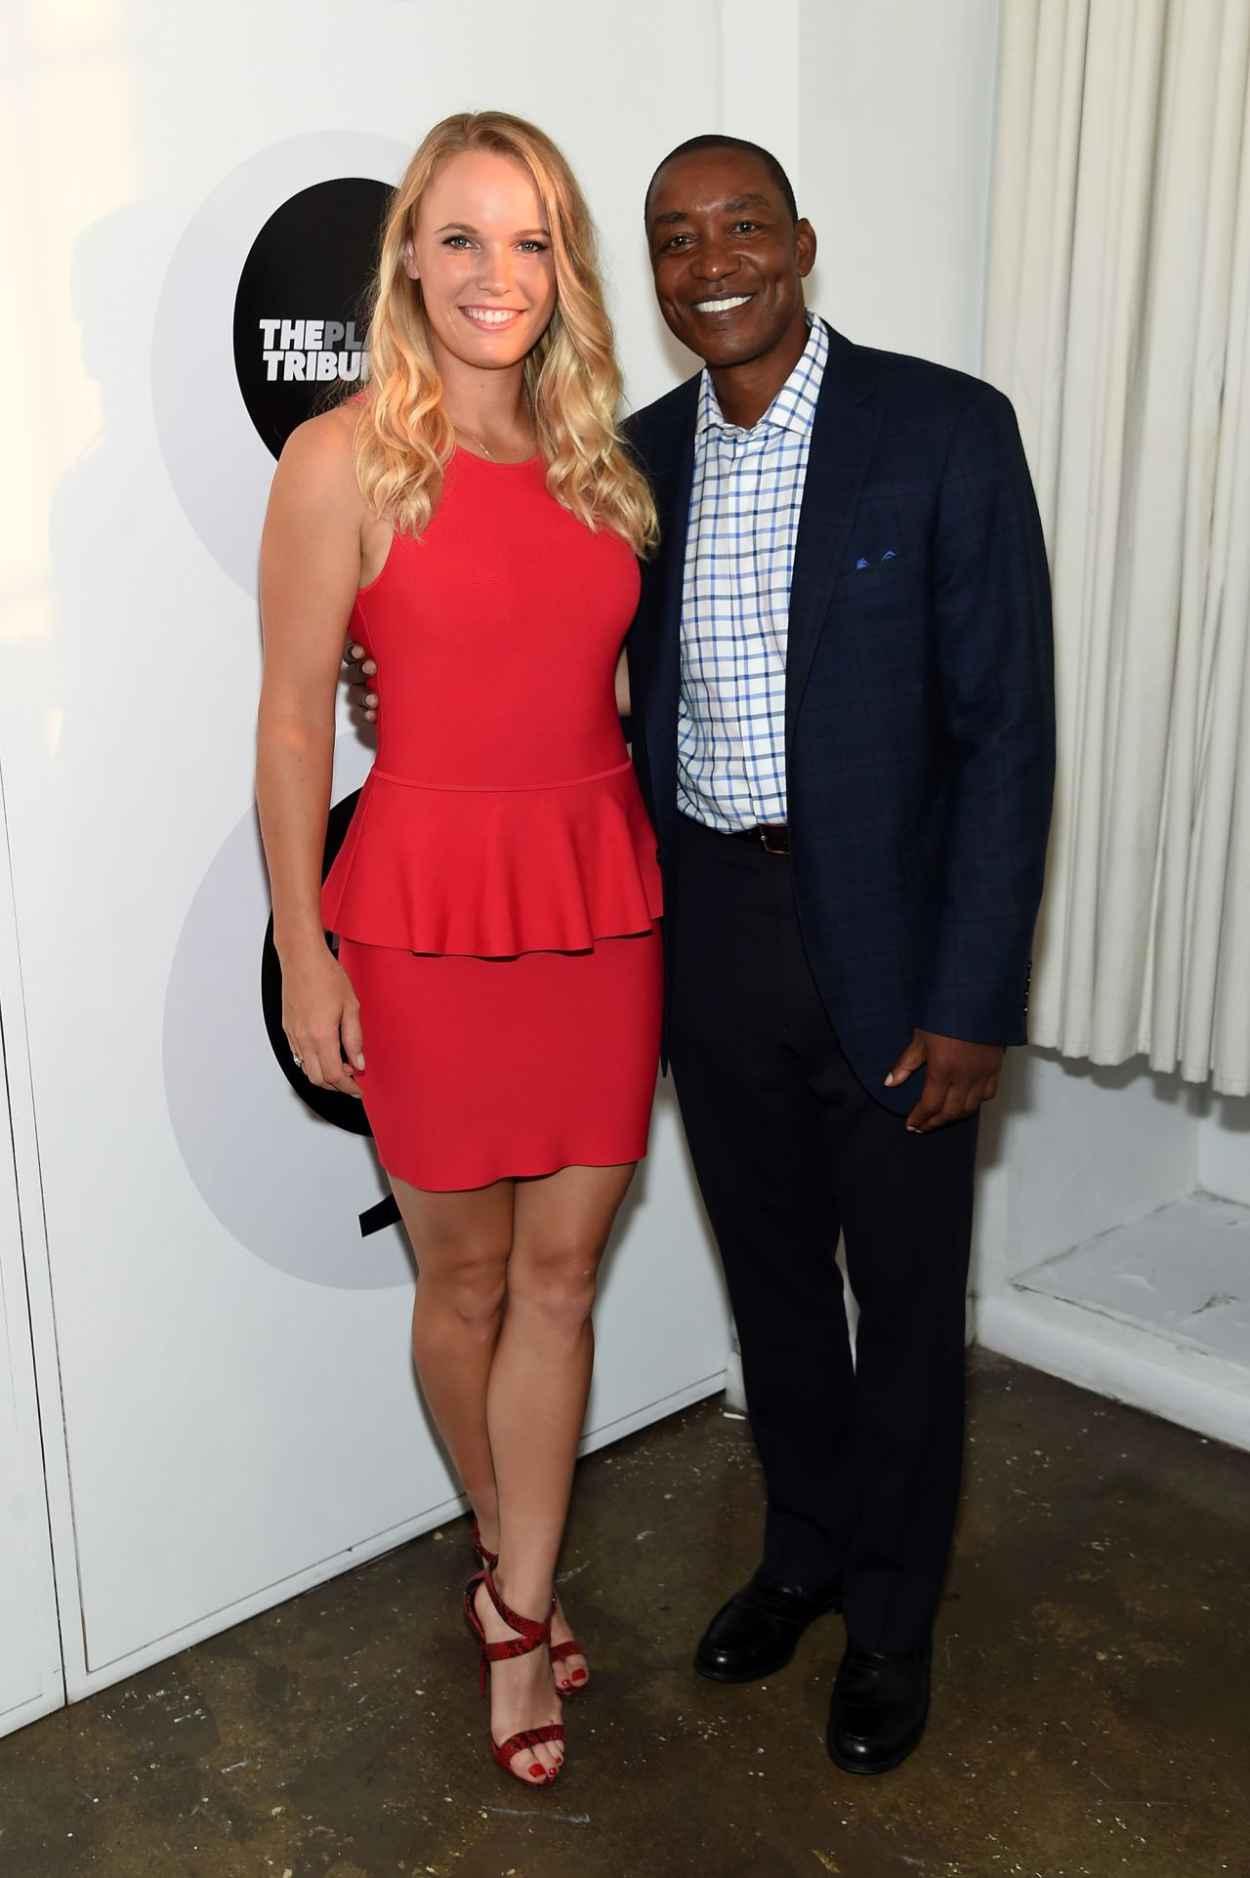 Caroline Wozniacki - Players Tribune Party to celebrate Women in Sports and the 2015 U.S. Open in New York City-3